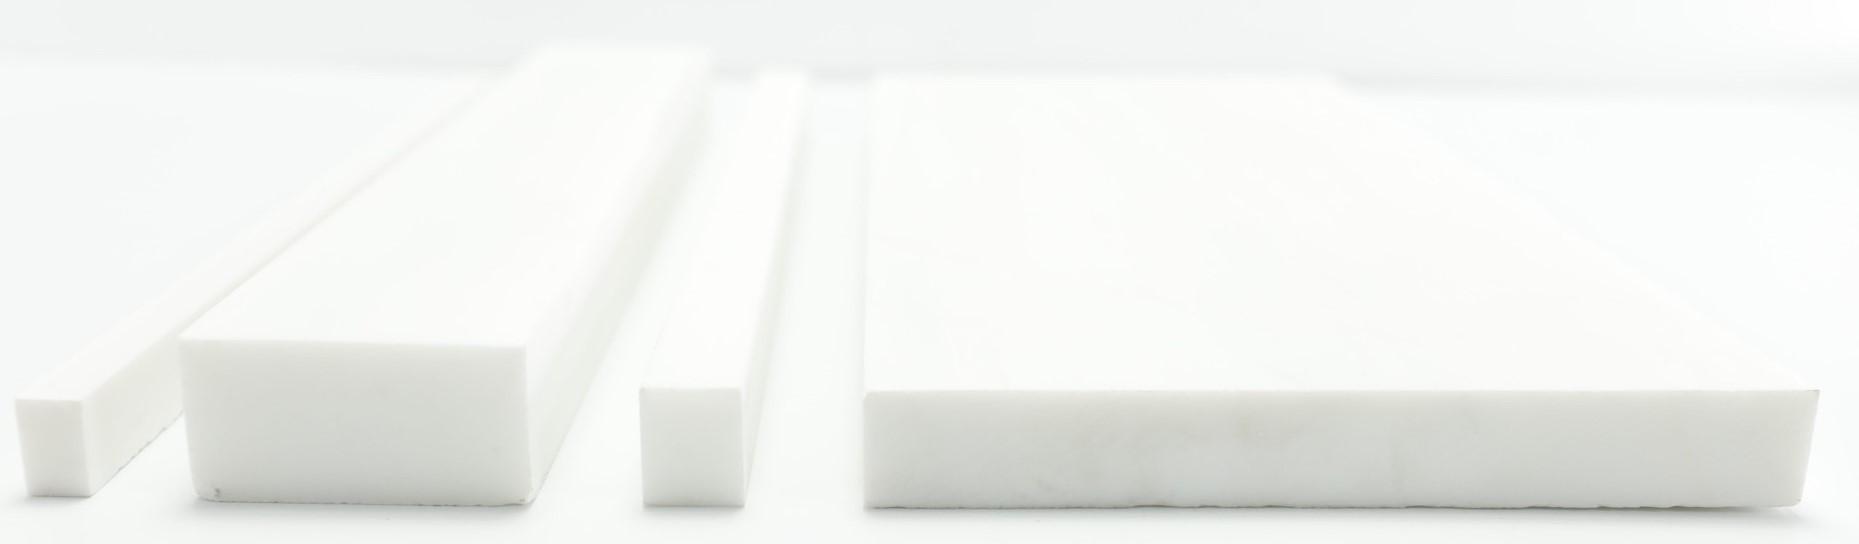 Block profiles